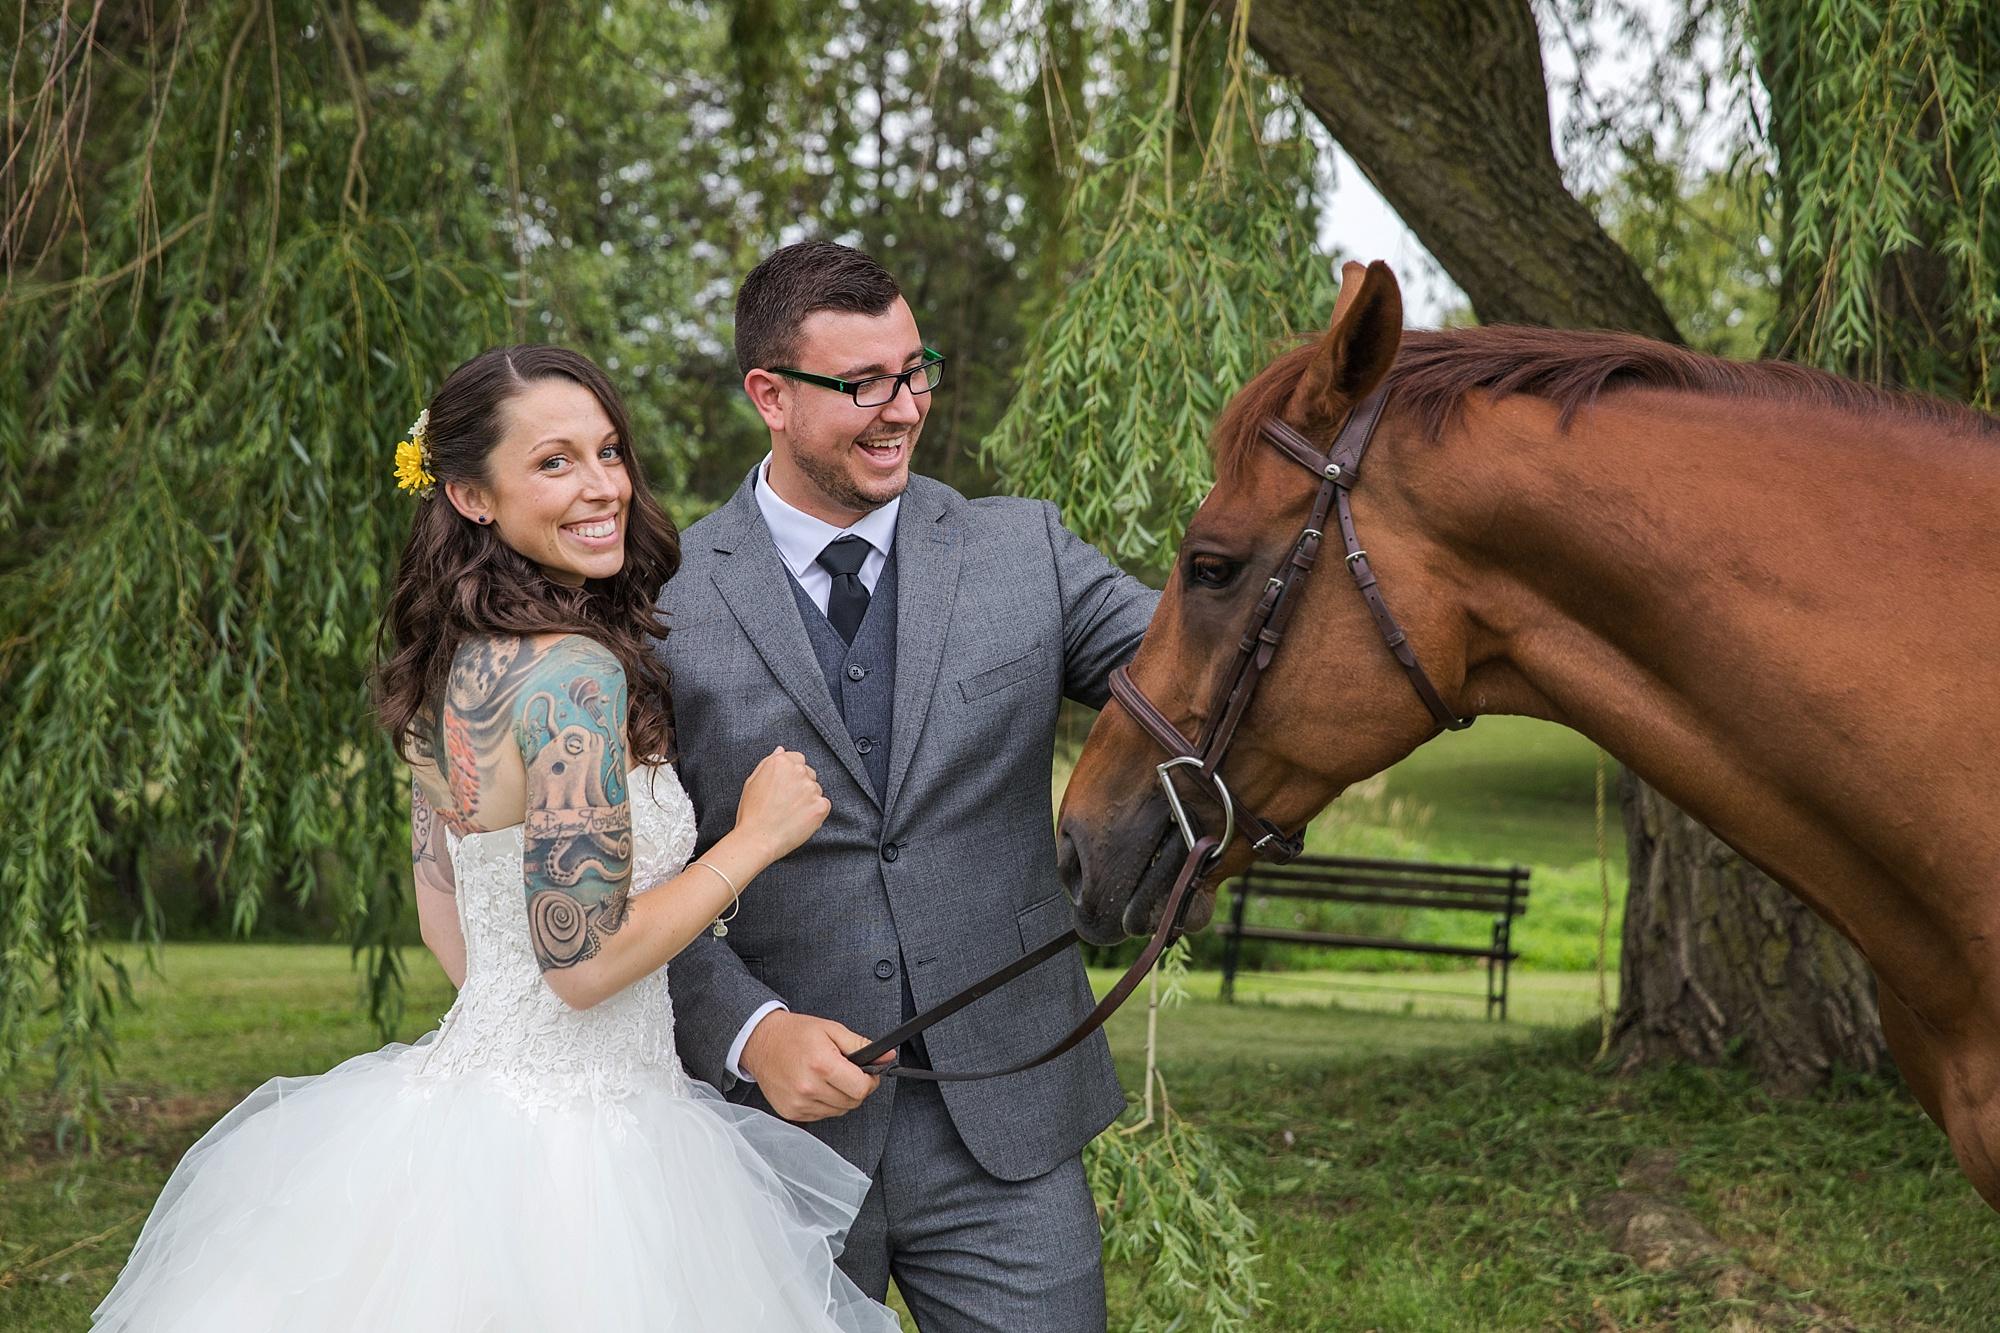 lipapark-hernderwinery-wedding_0053.jpg